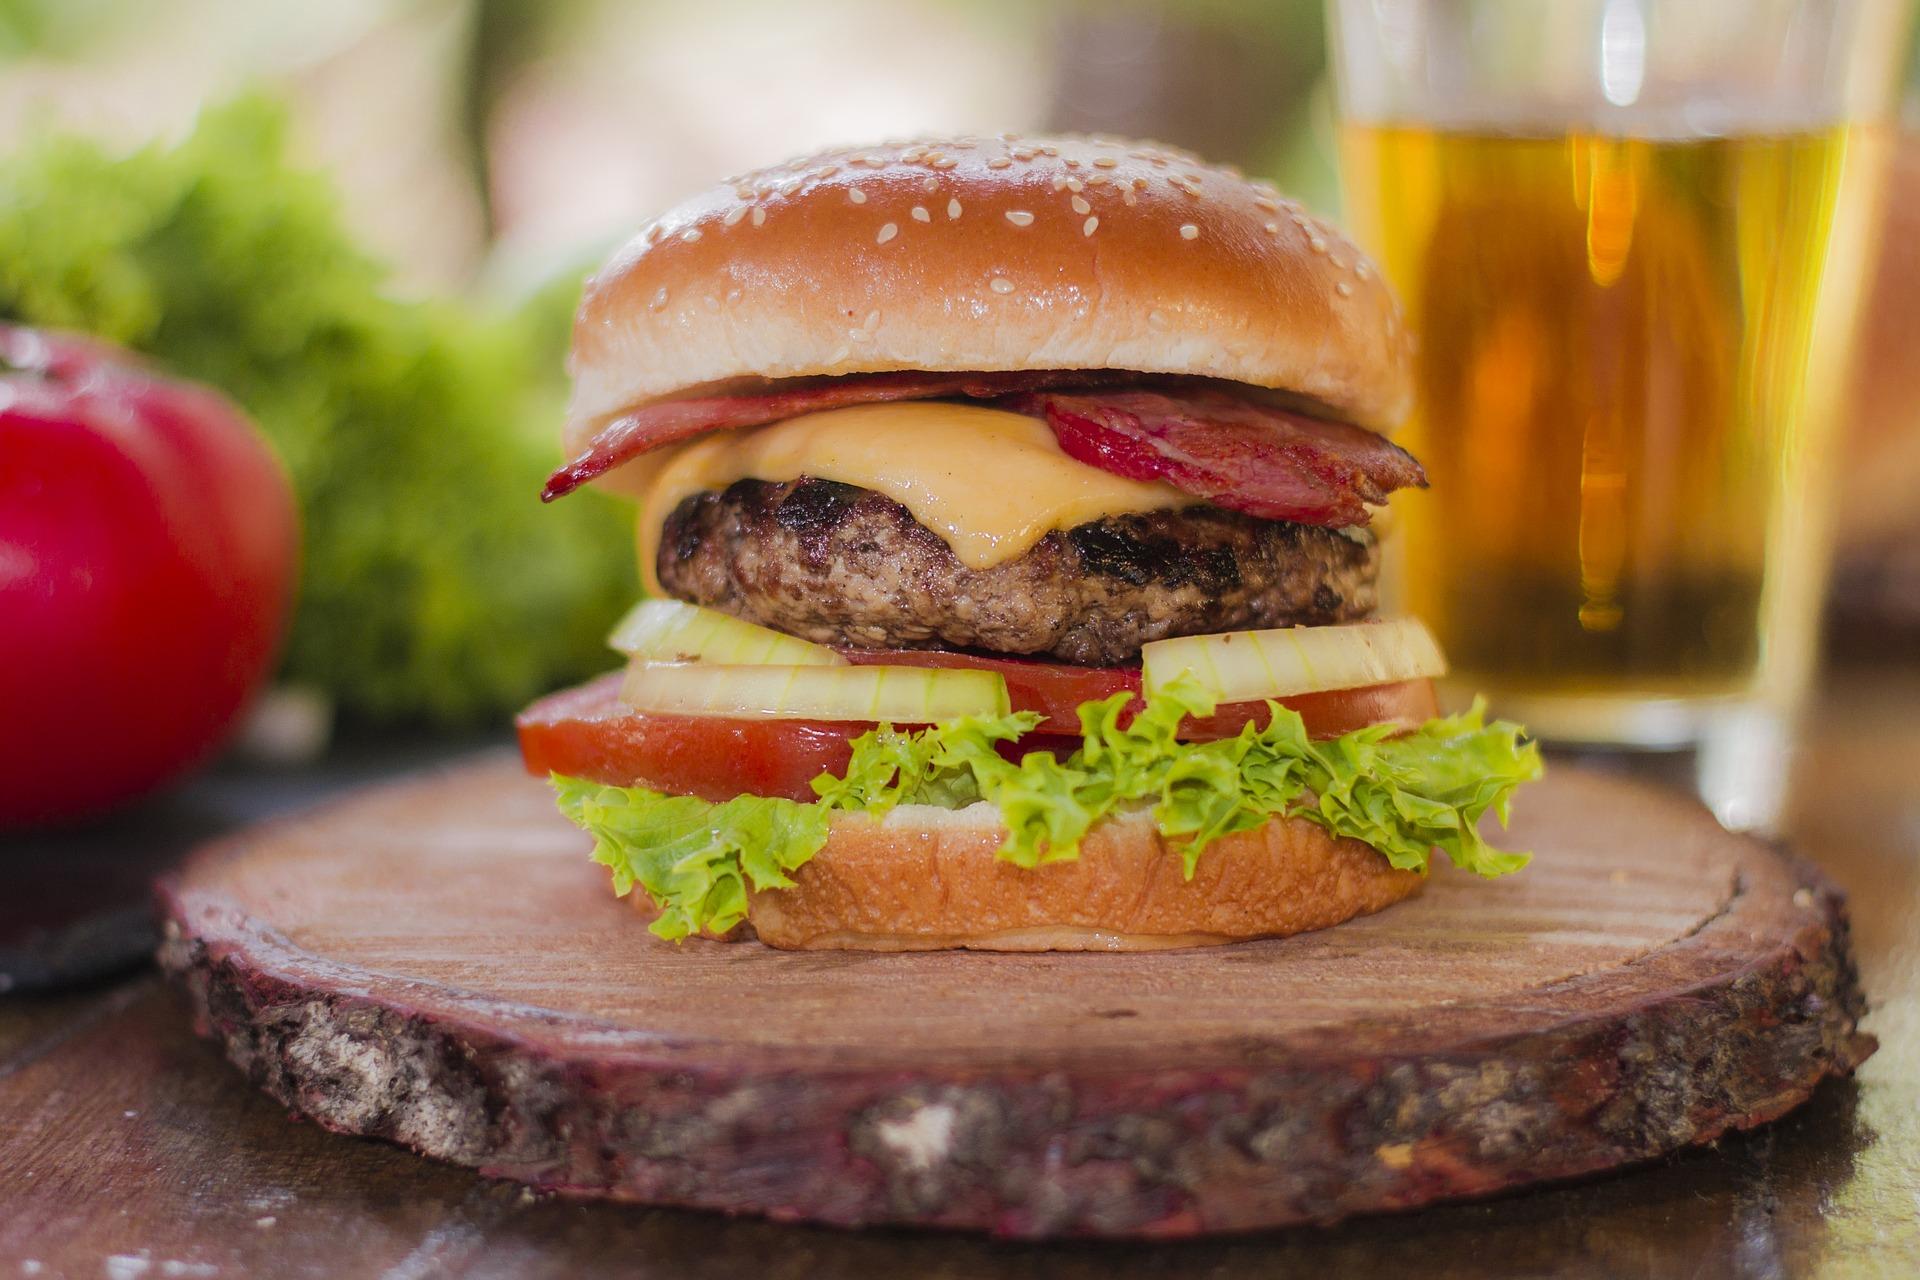 Meat-based alternatives gaining popularity around the world